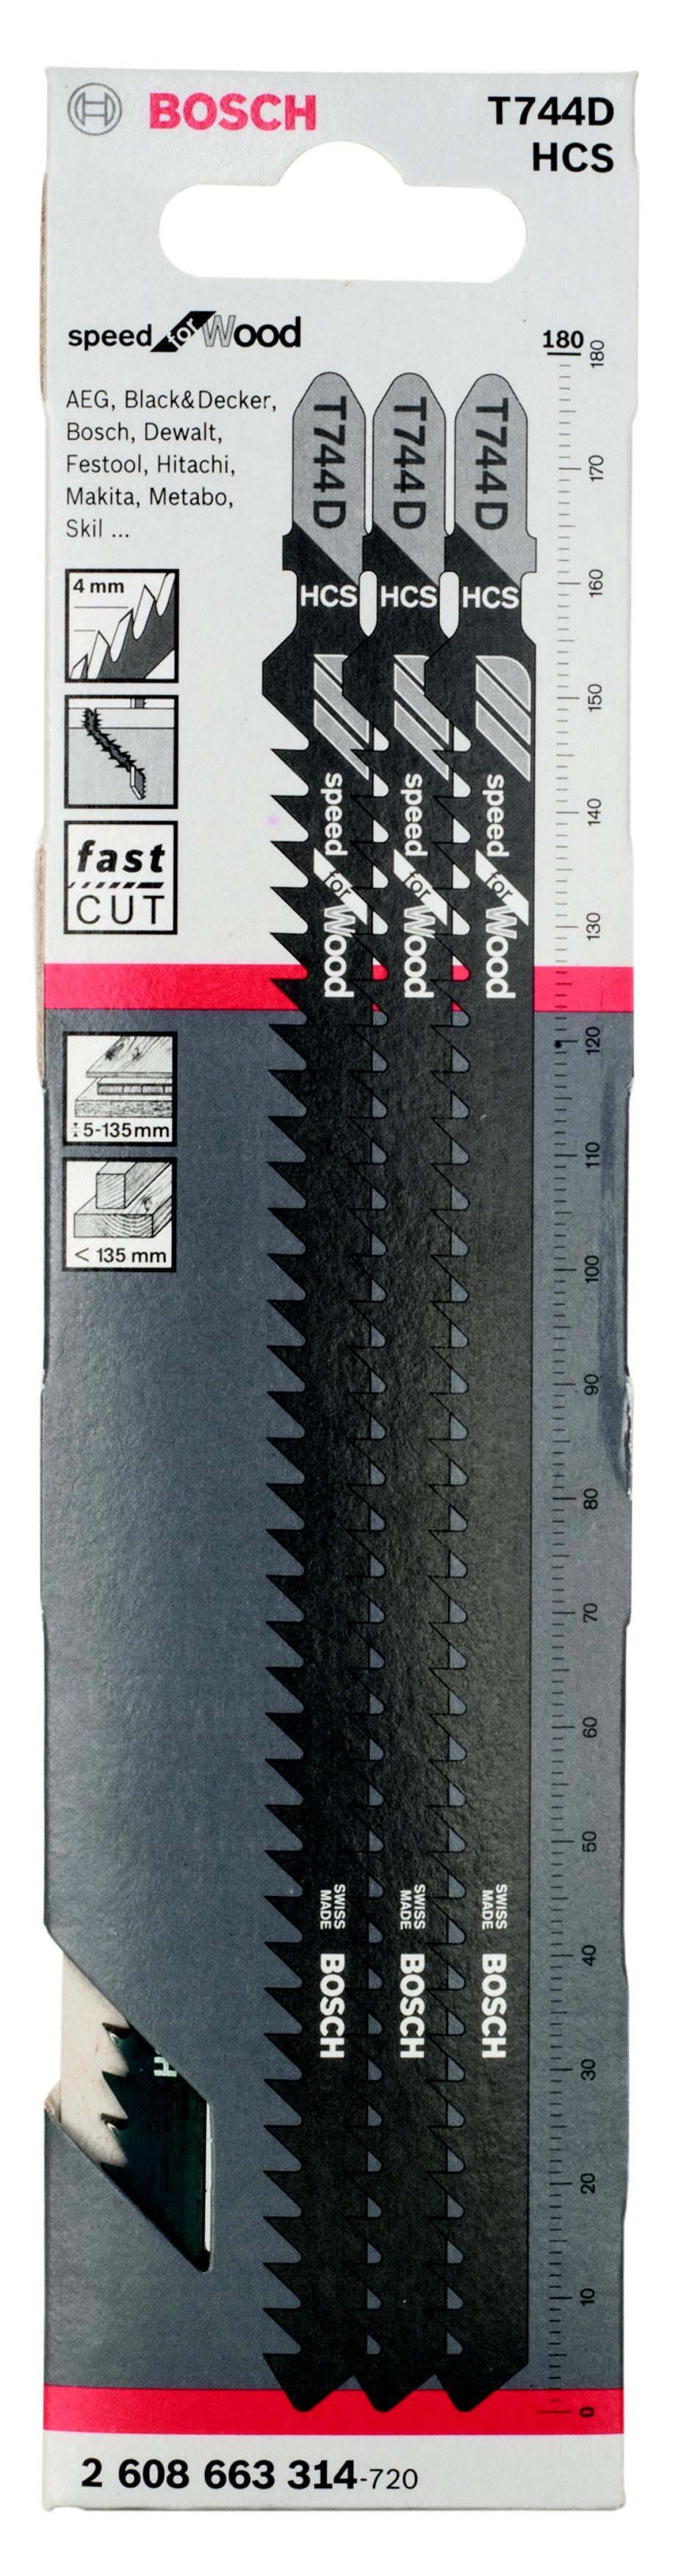 Пилки для лобзика Bosch 2608663314 пилки для лобзика bosch 2608637879